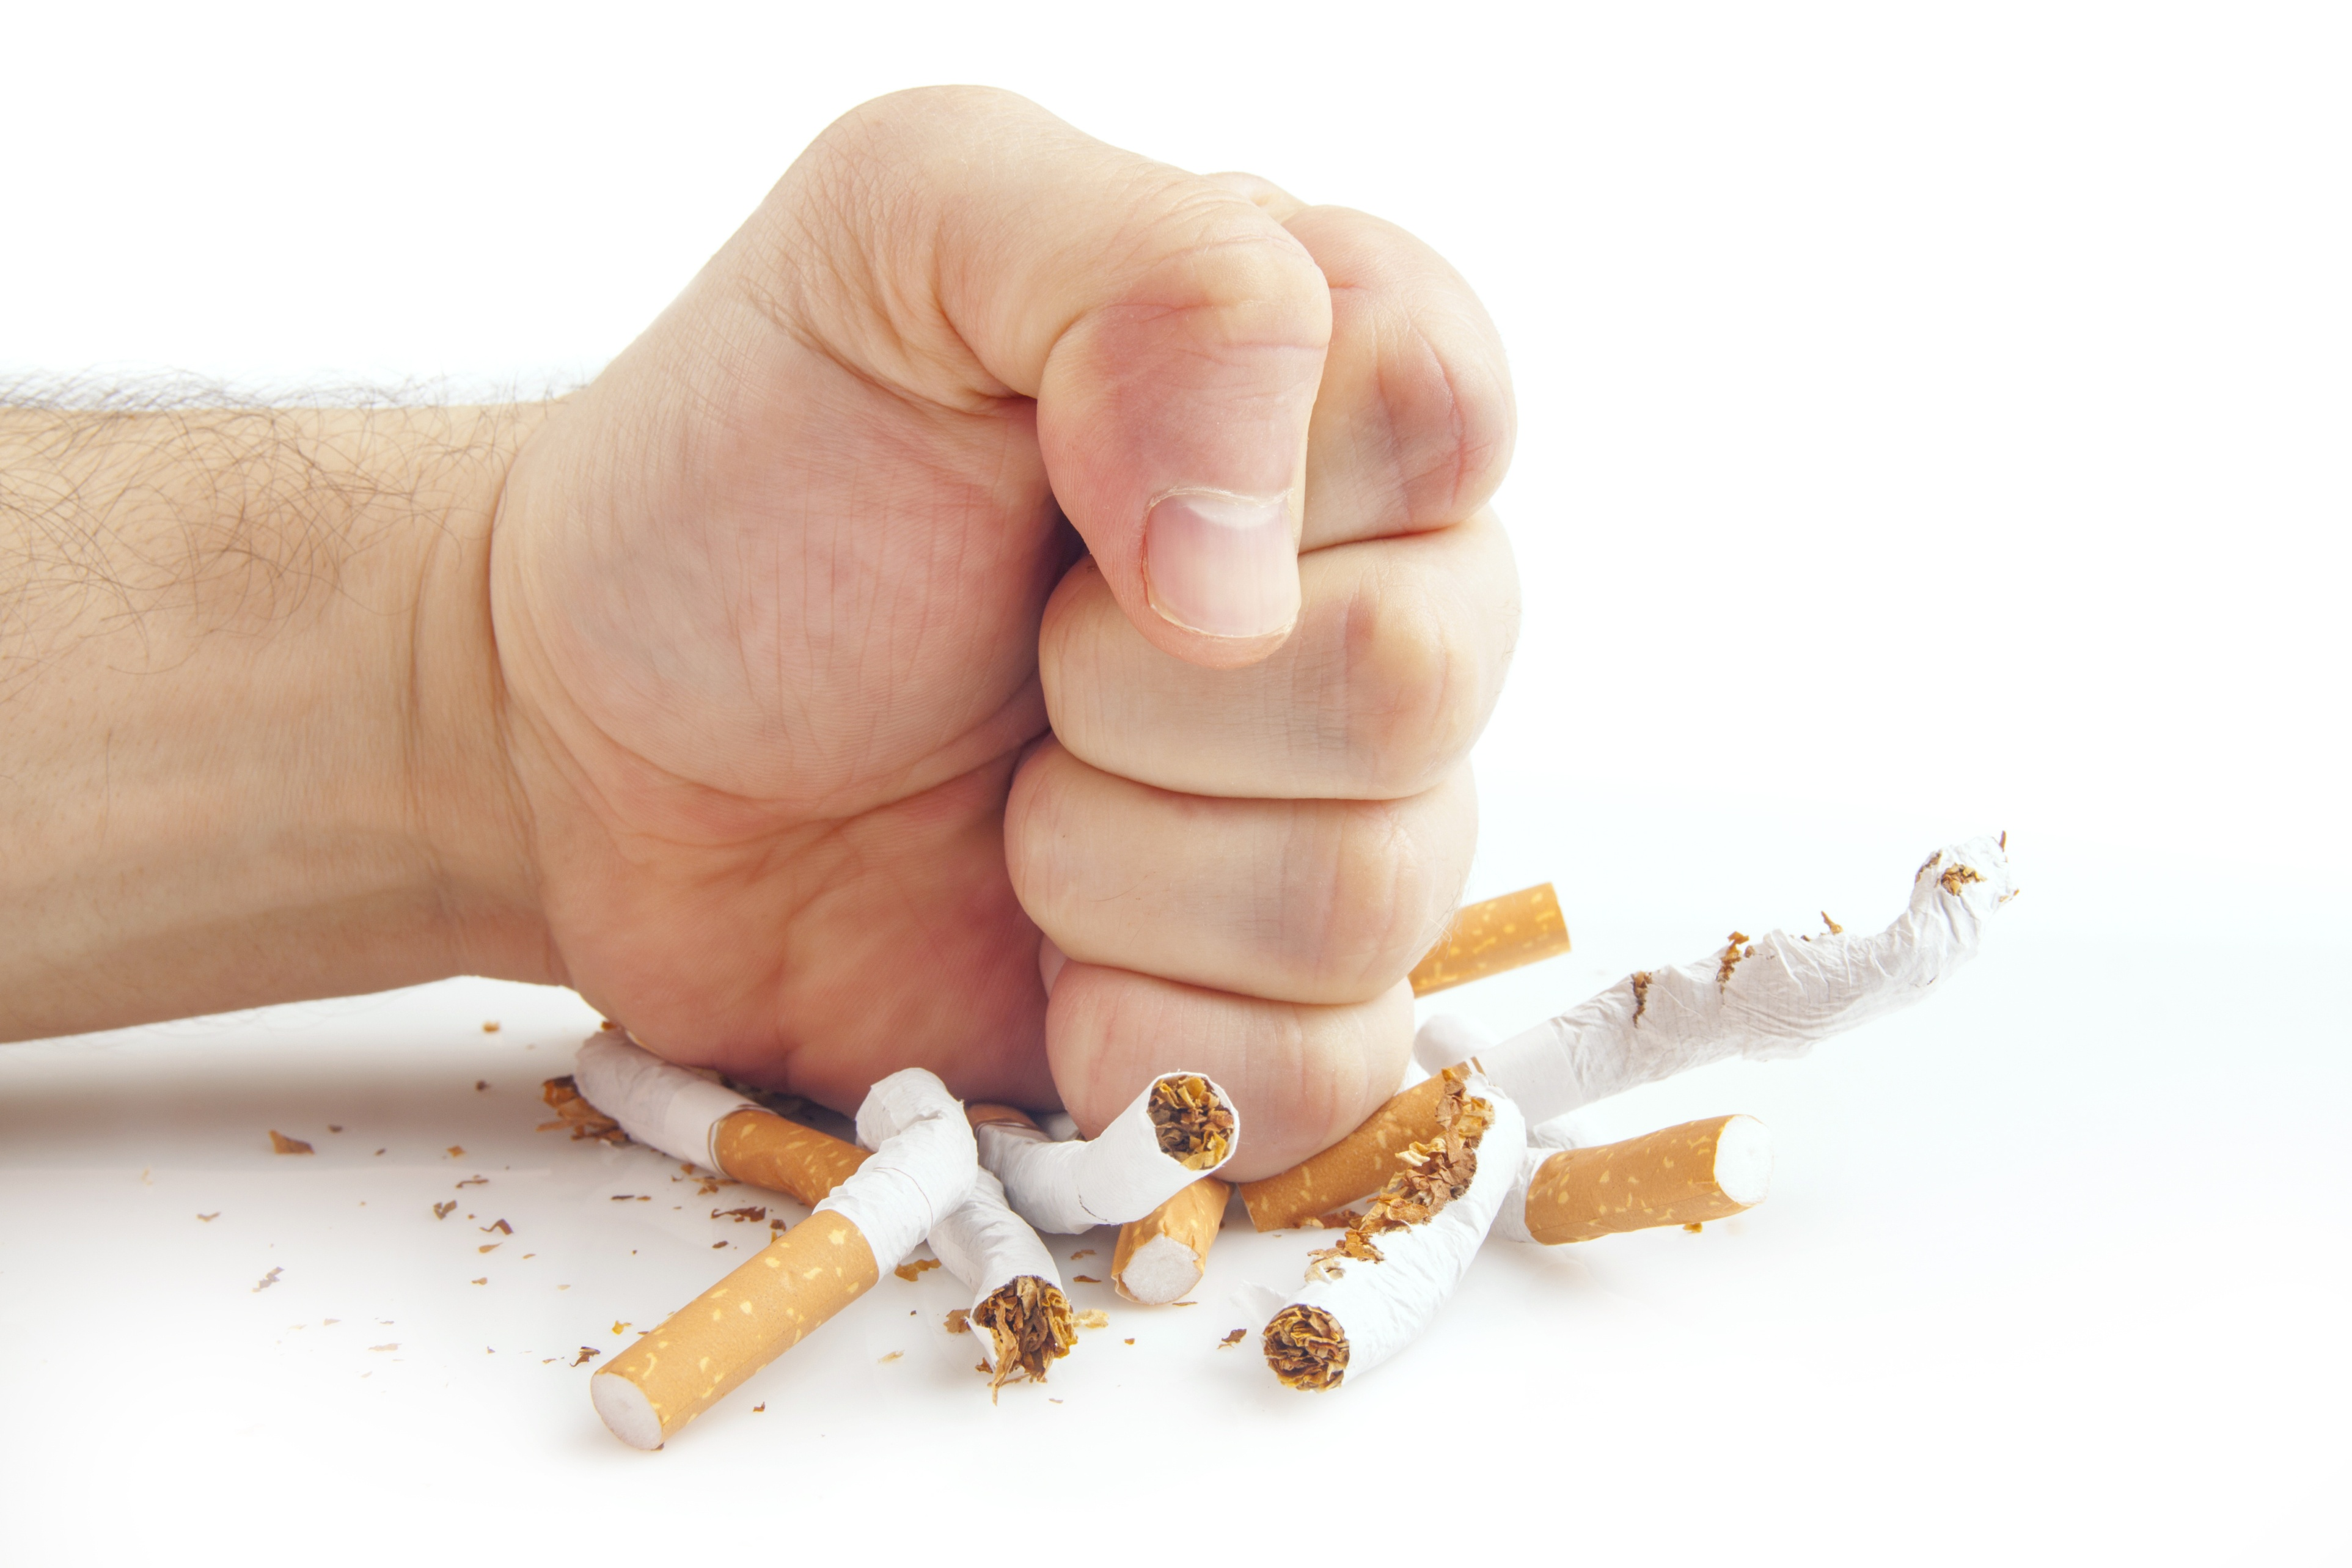 ssiimm quit smoking 1 - نکاتی که بعد از ترک سیگار باید رعایت کنید.